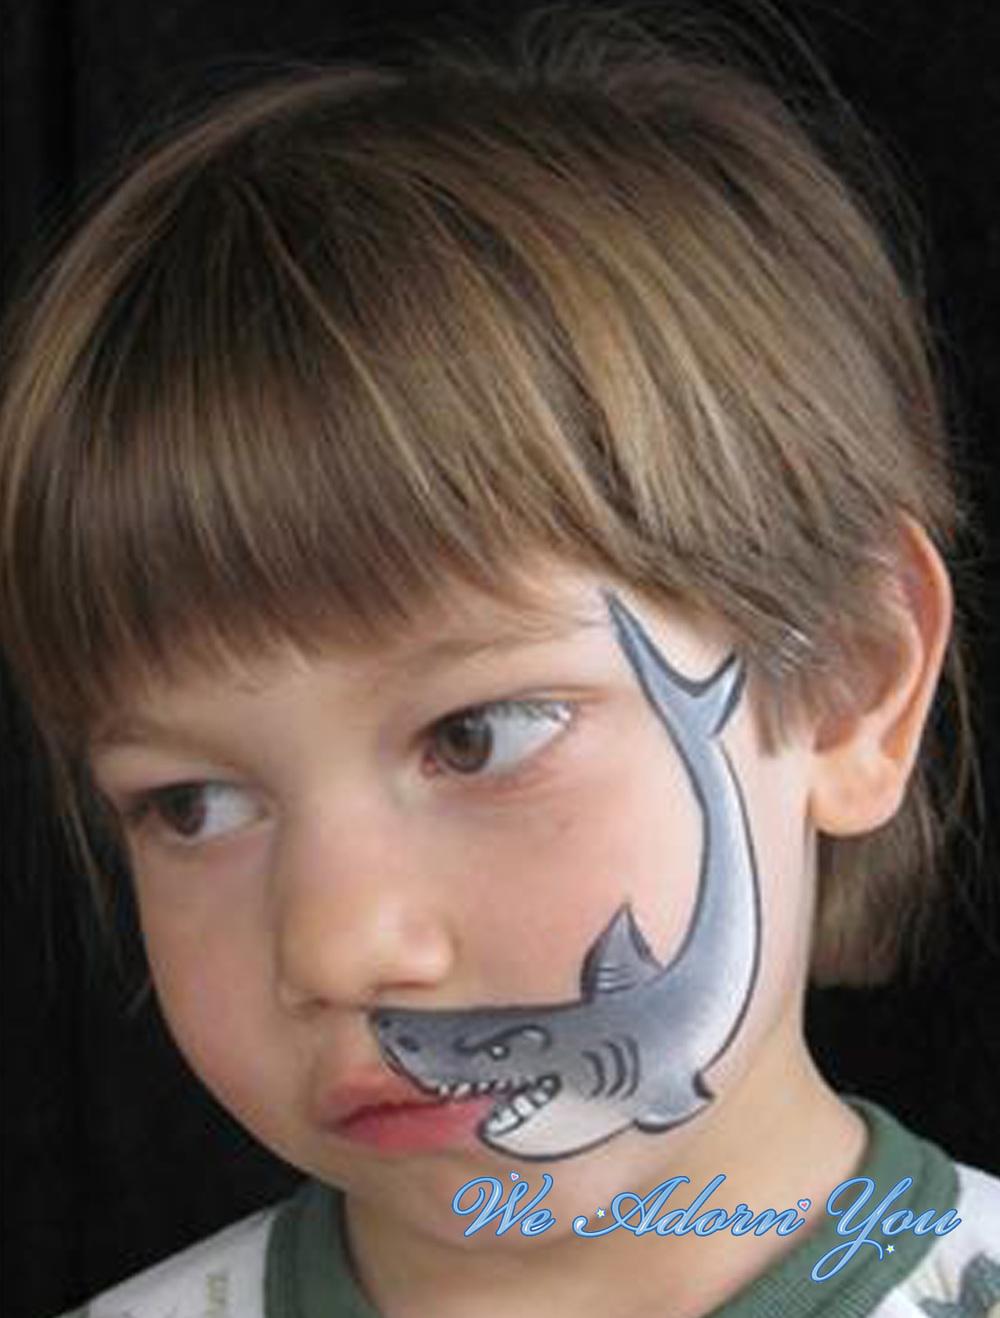 Face Painting Shark- We Adorn You.jpg